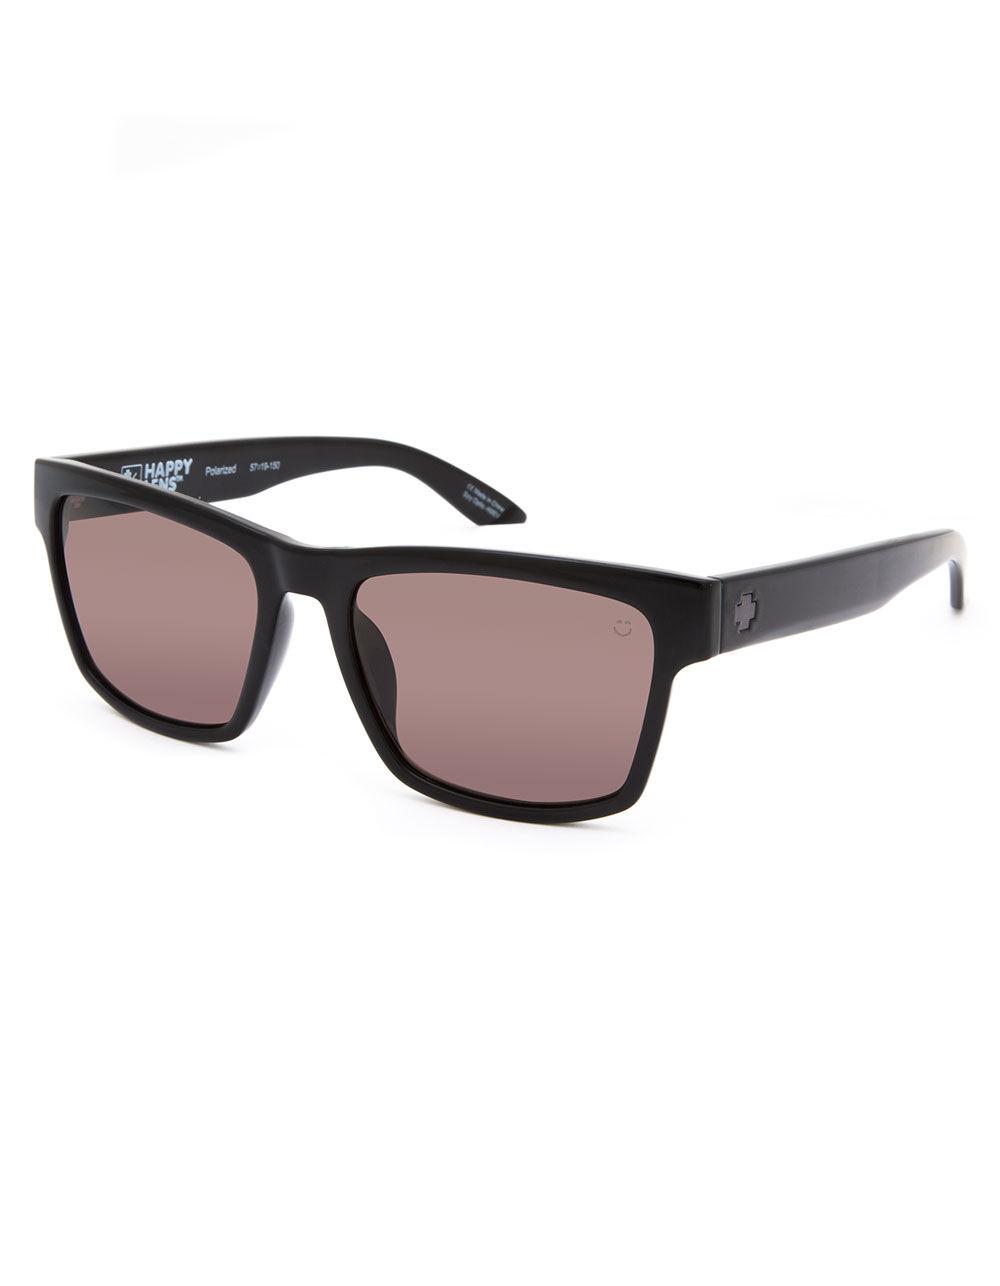 SPY Haight 2 Polarized Sunglasses